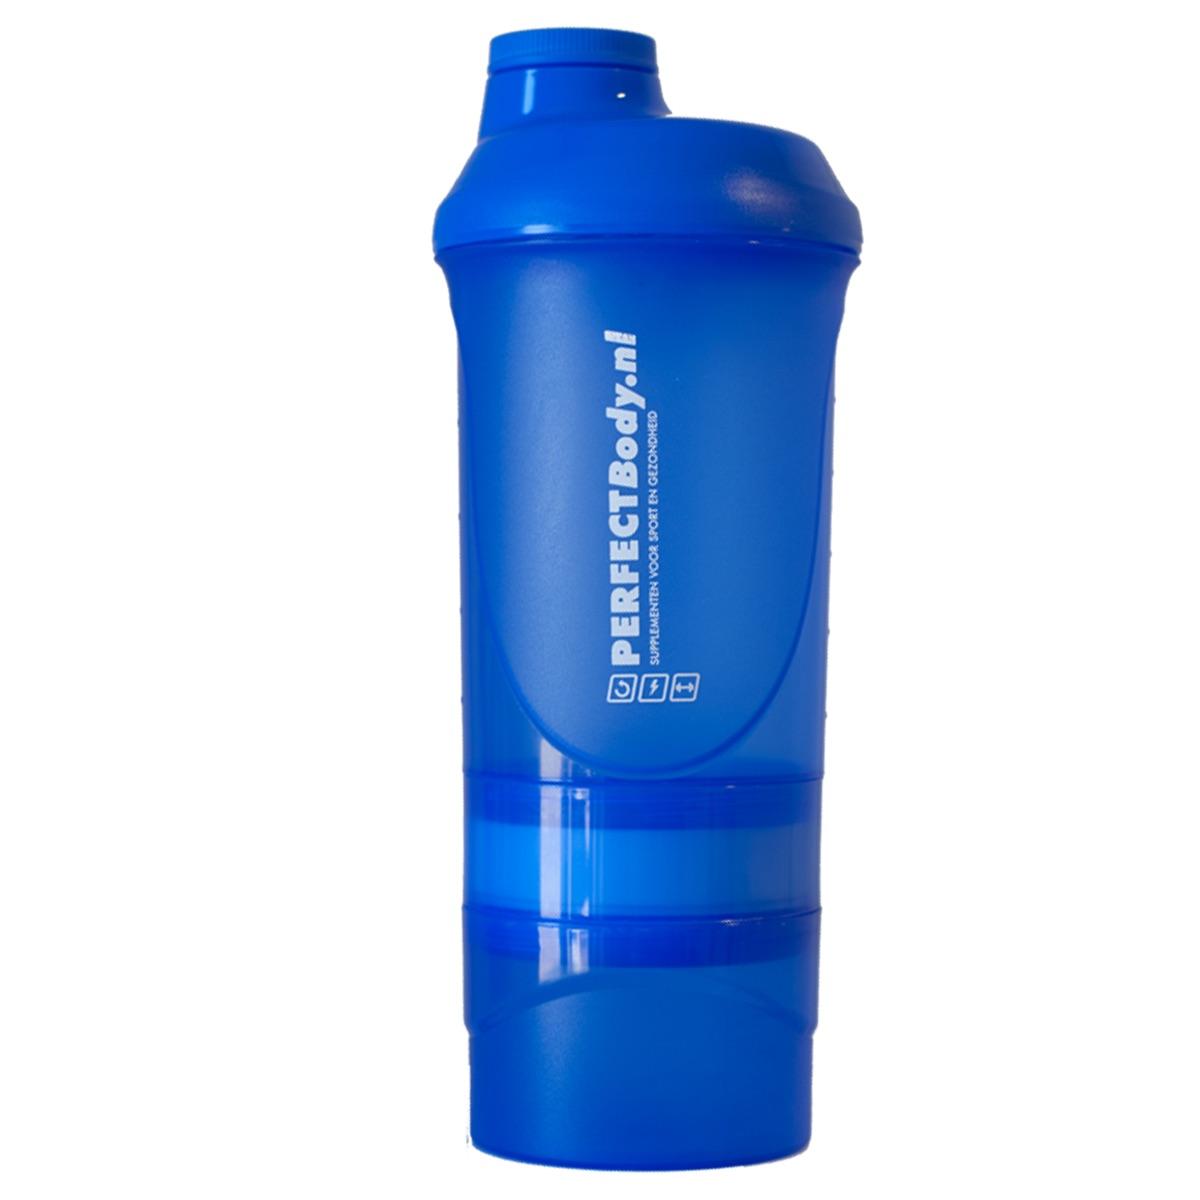 proteine shakes kopen